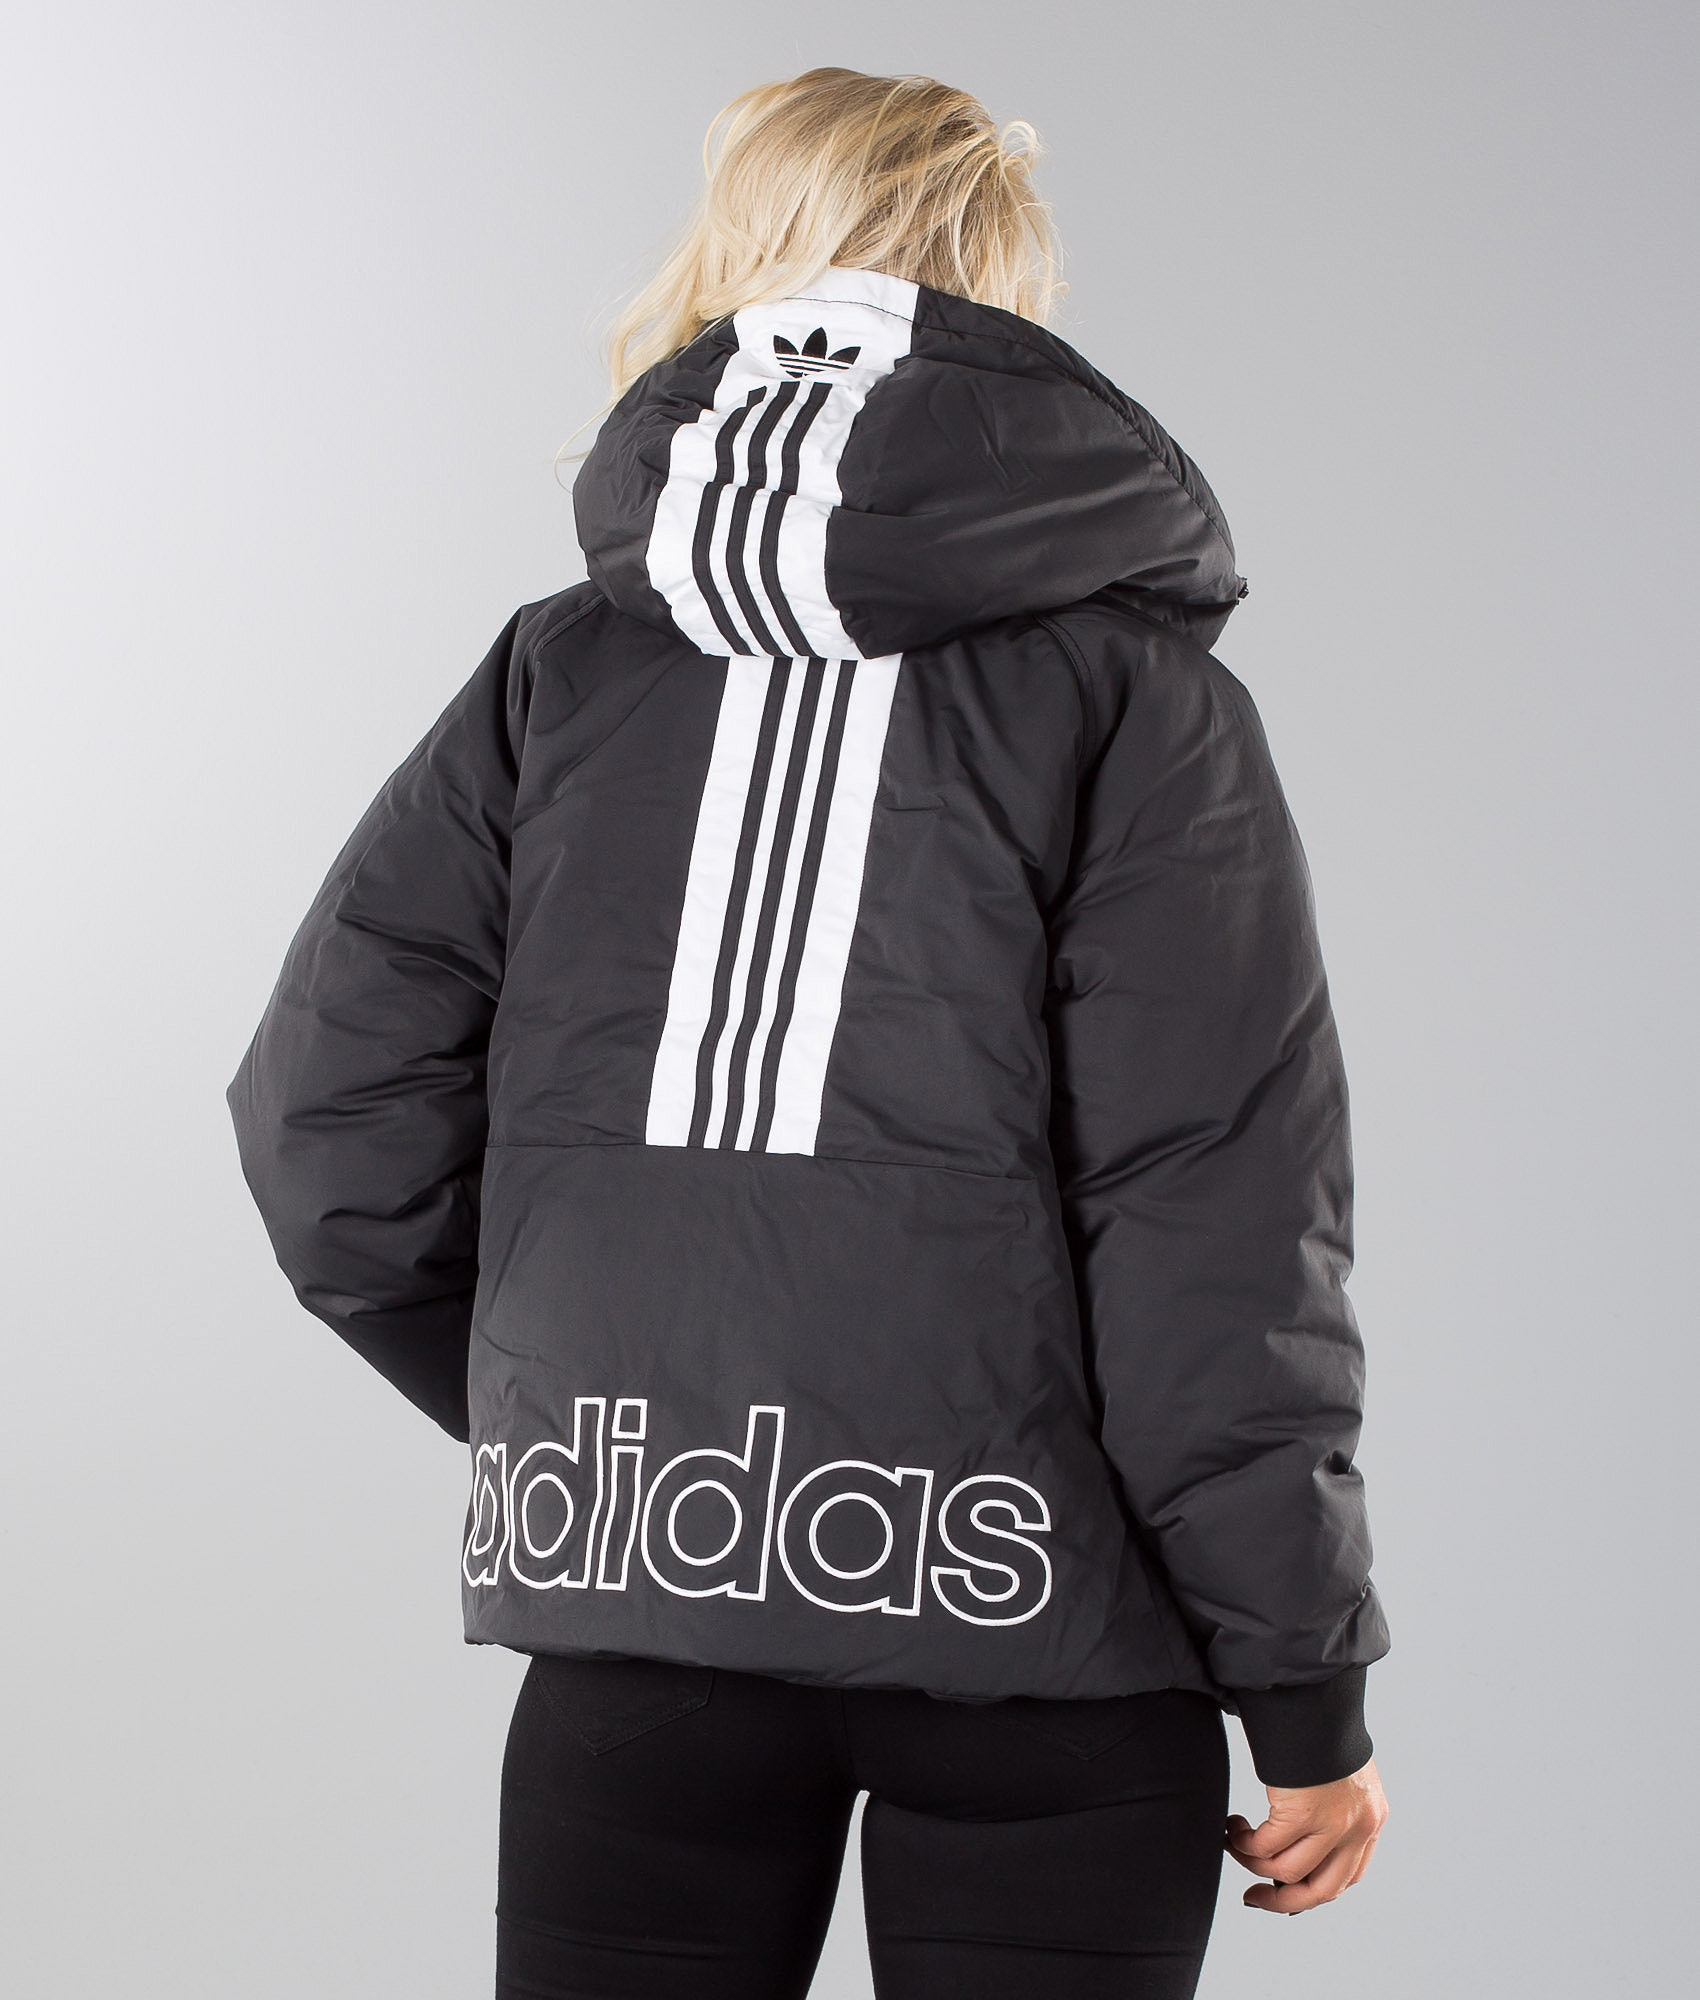 61bf371819c8 Adidas Originals Short Down Jacket Black - Ridestore.com